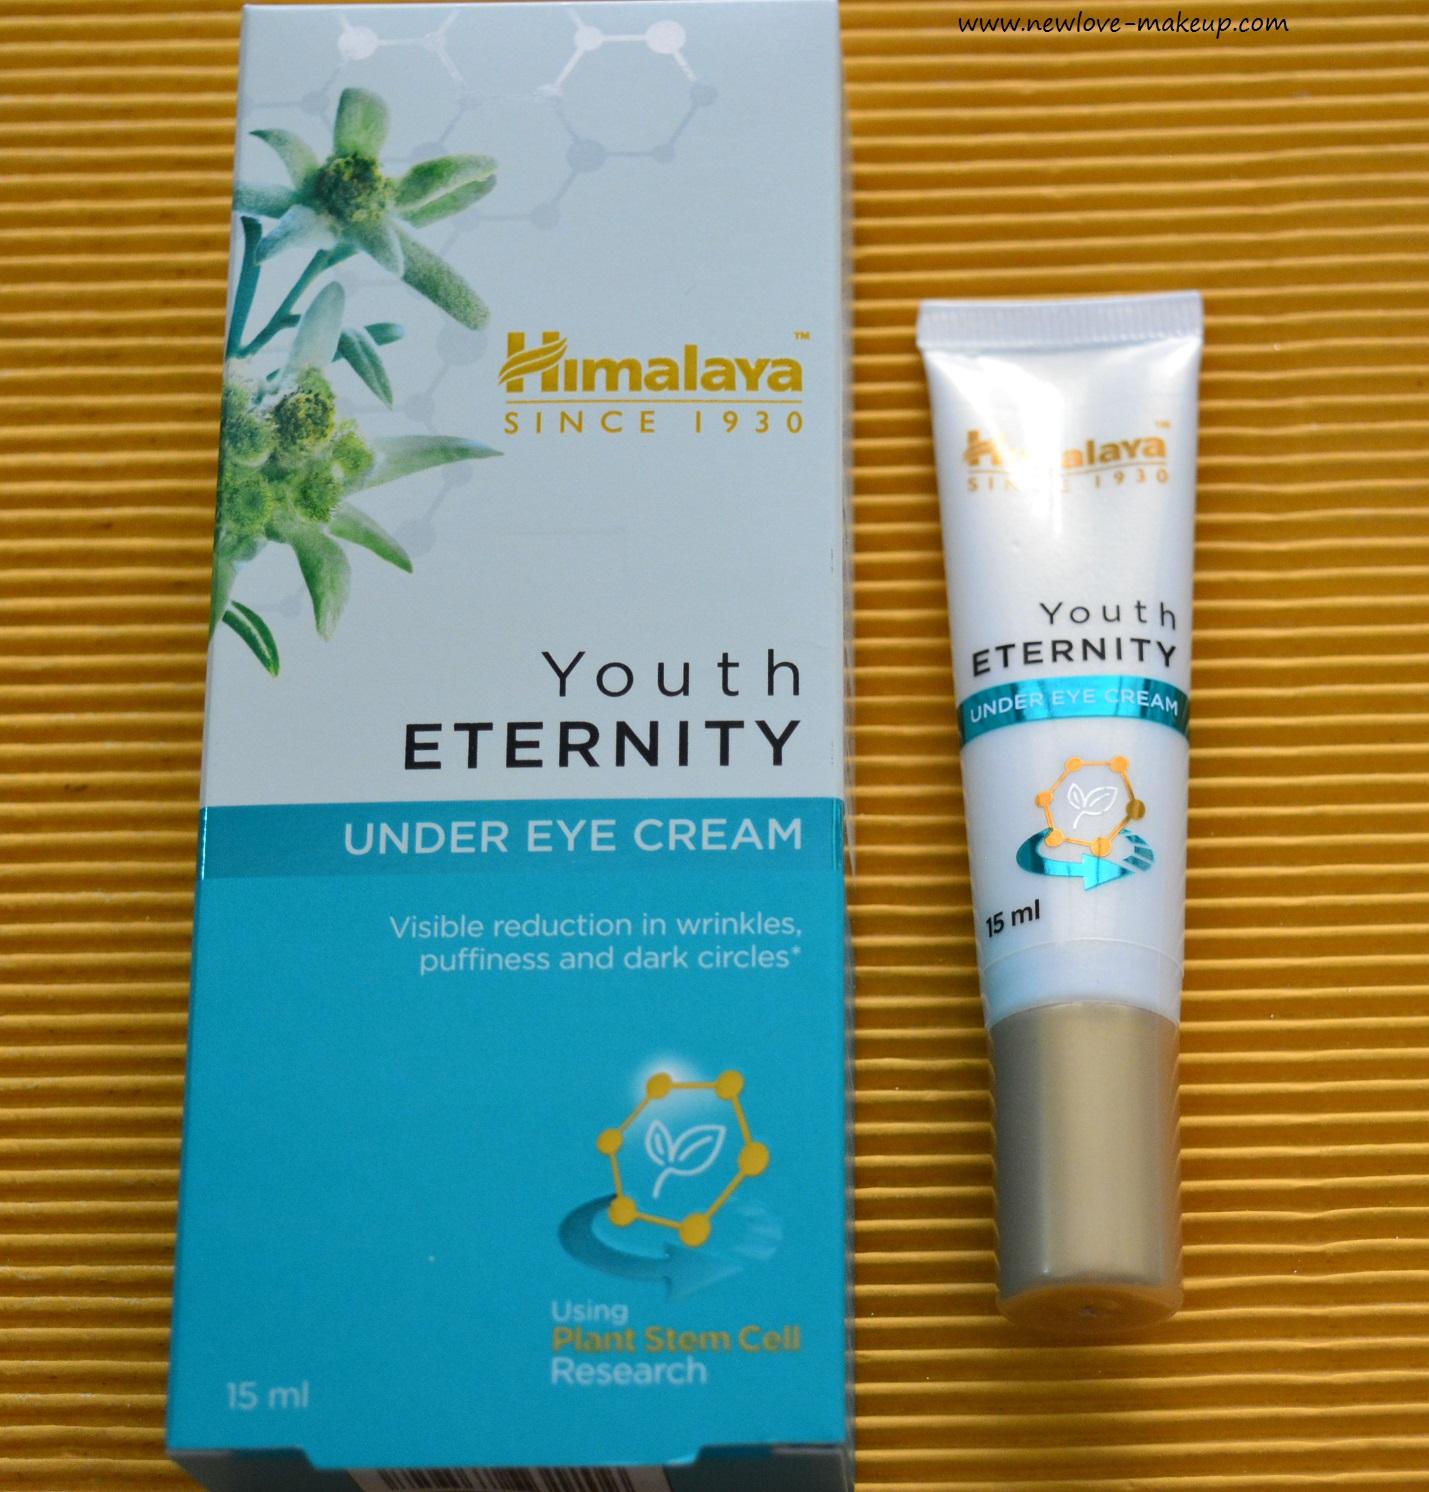 Himalaya Youth Eternity Range Launch, Review